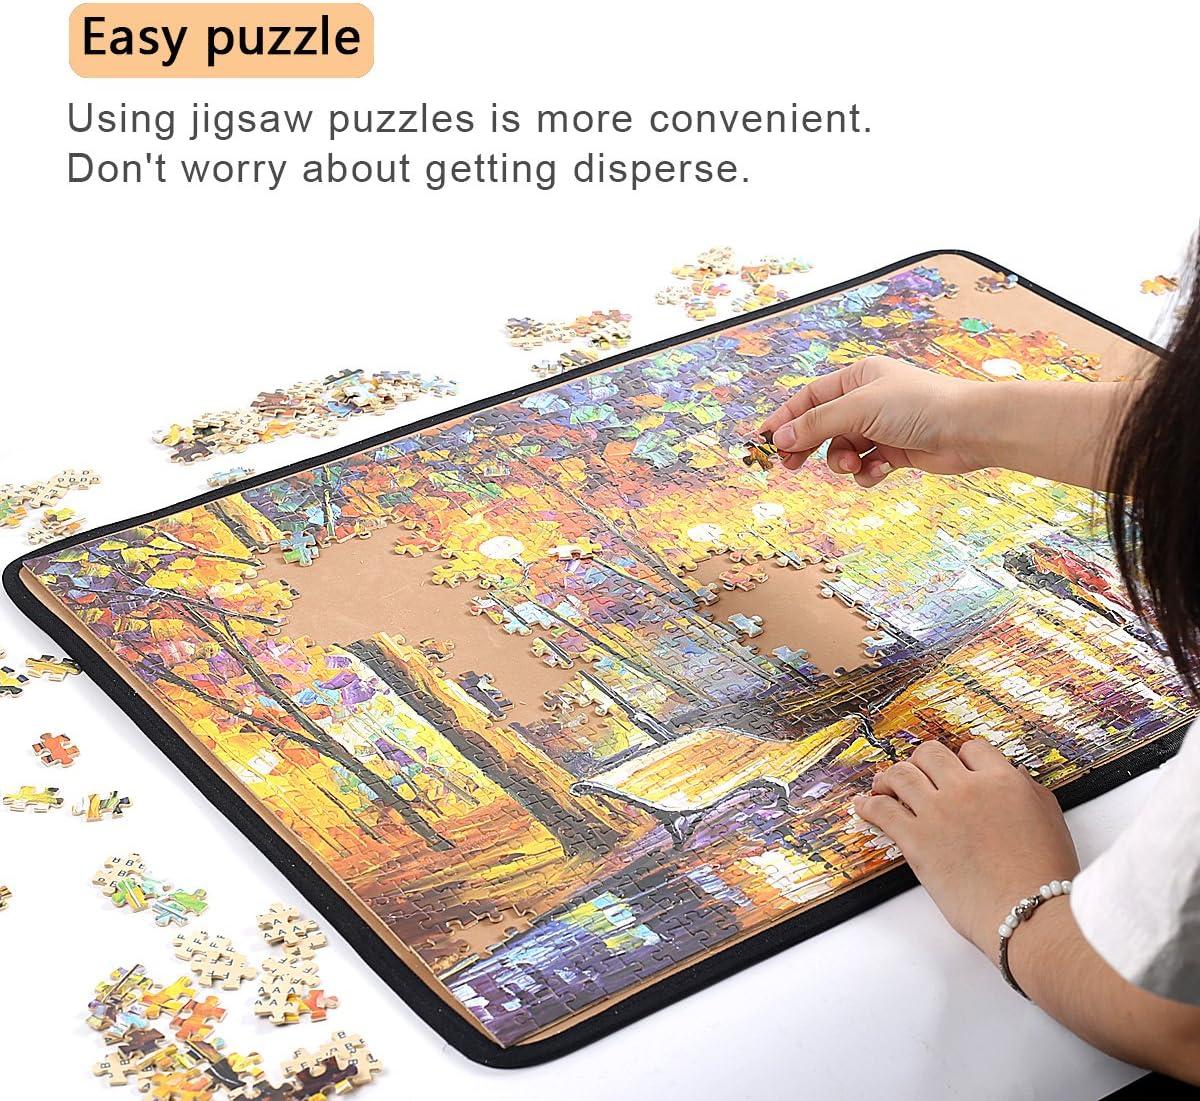 Ingooood Jigsaw puzzle Board Puzzle Mat